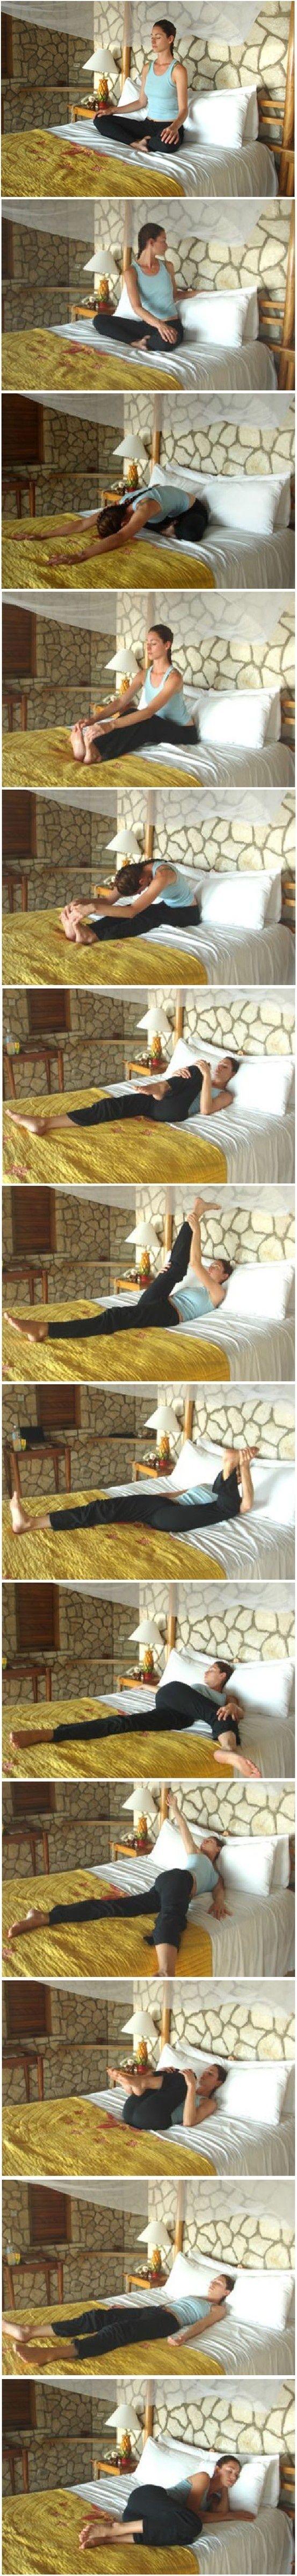 bed time yoga I LOVE Tara Stiles!!!